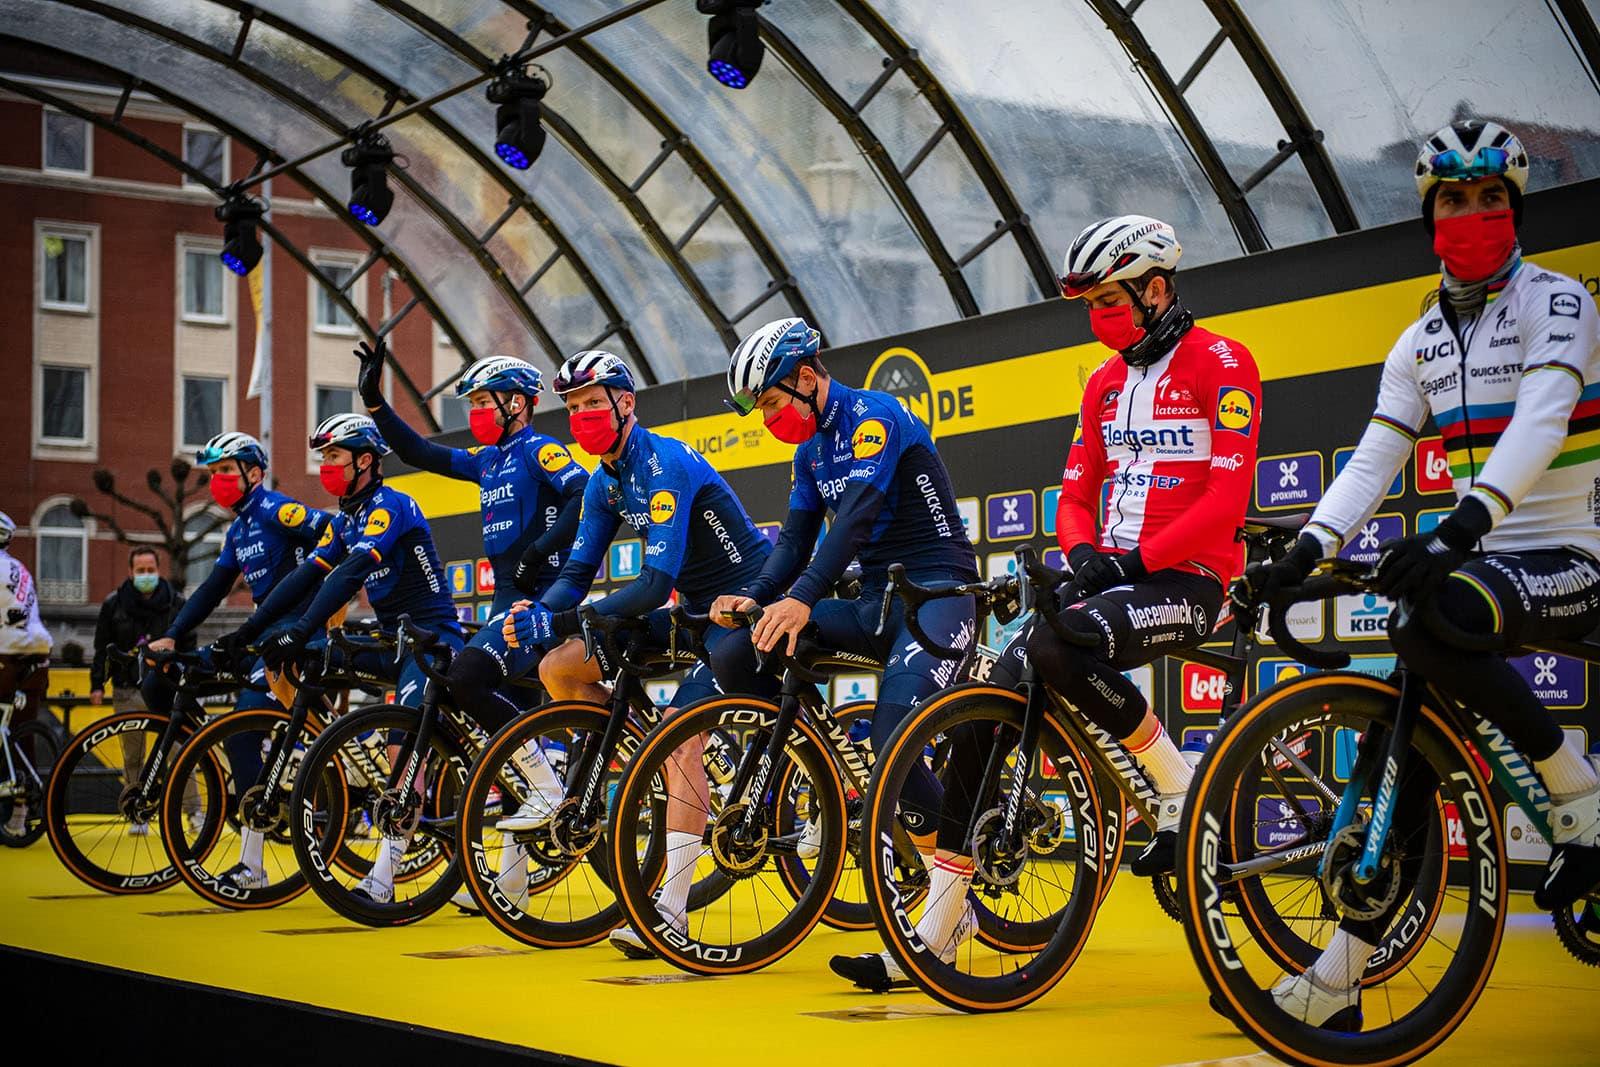 Team Deceuninck - Credit @Billy_lebelge